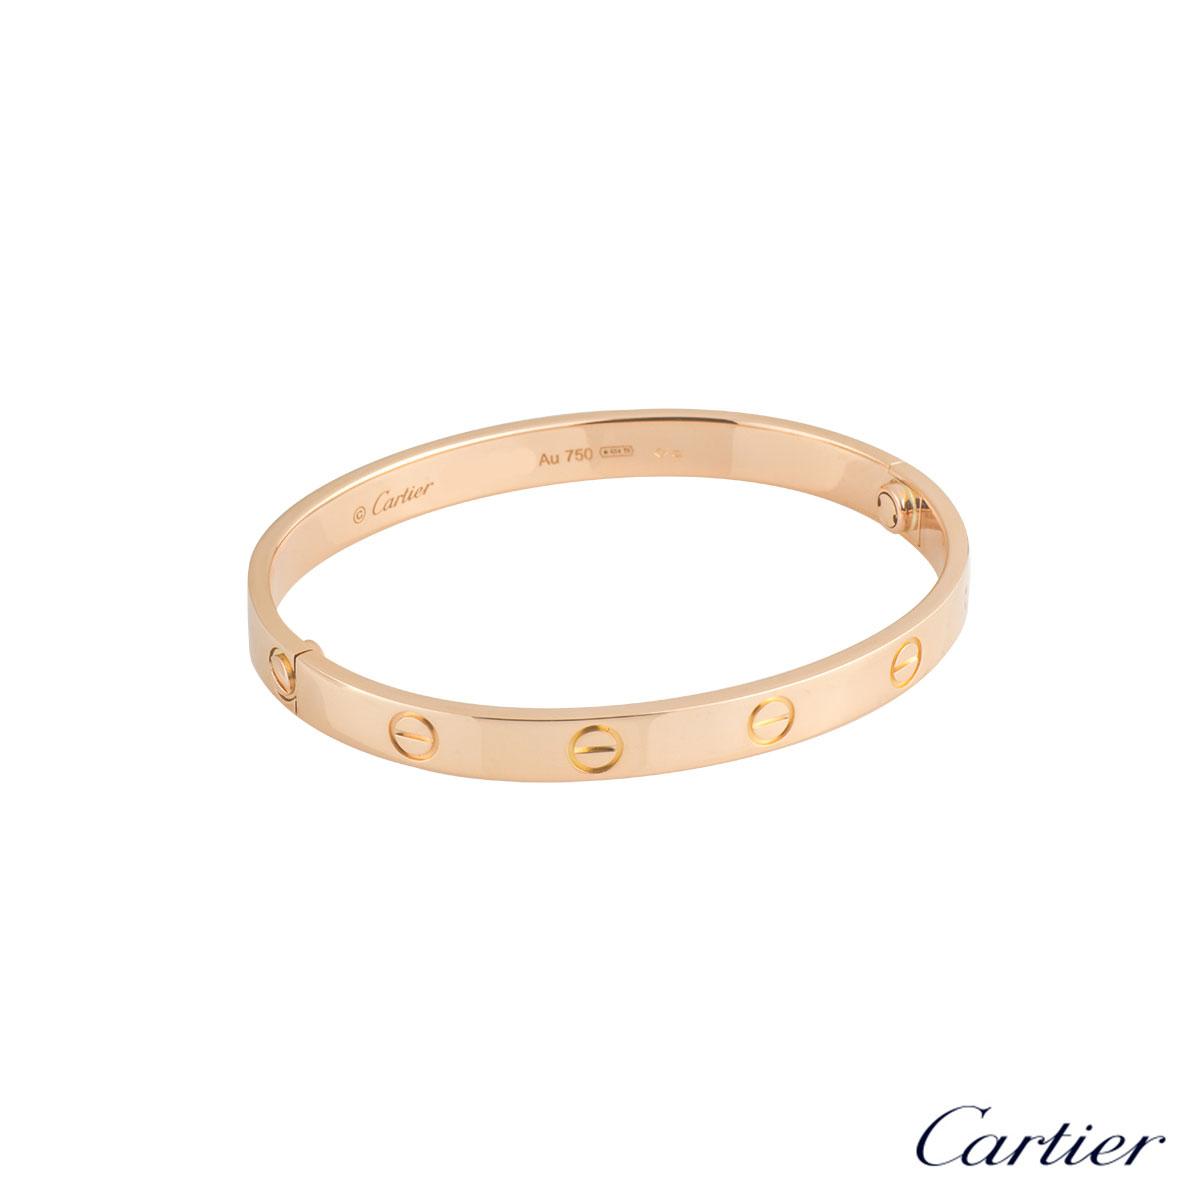 CartierRose Gold Plain Love Bracelet Size 19 B6035619